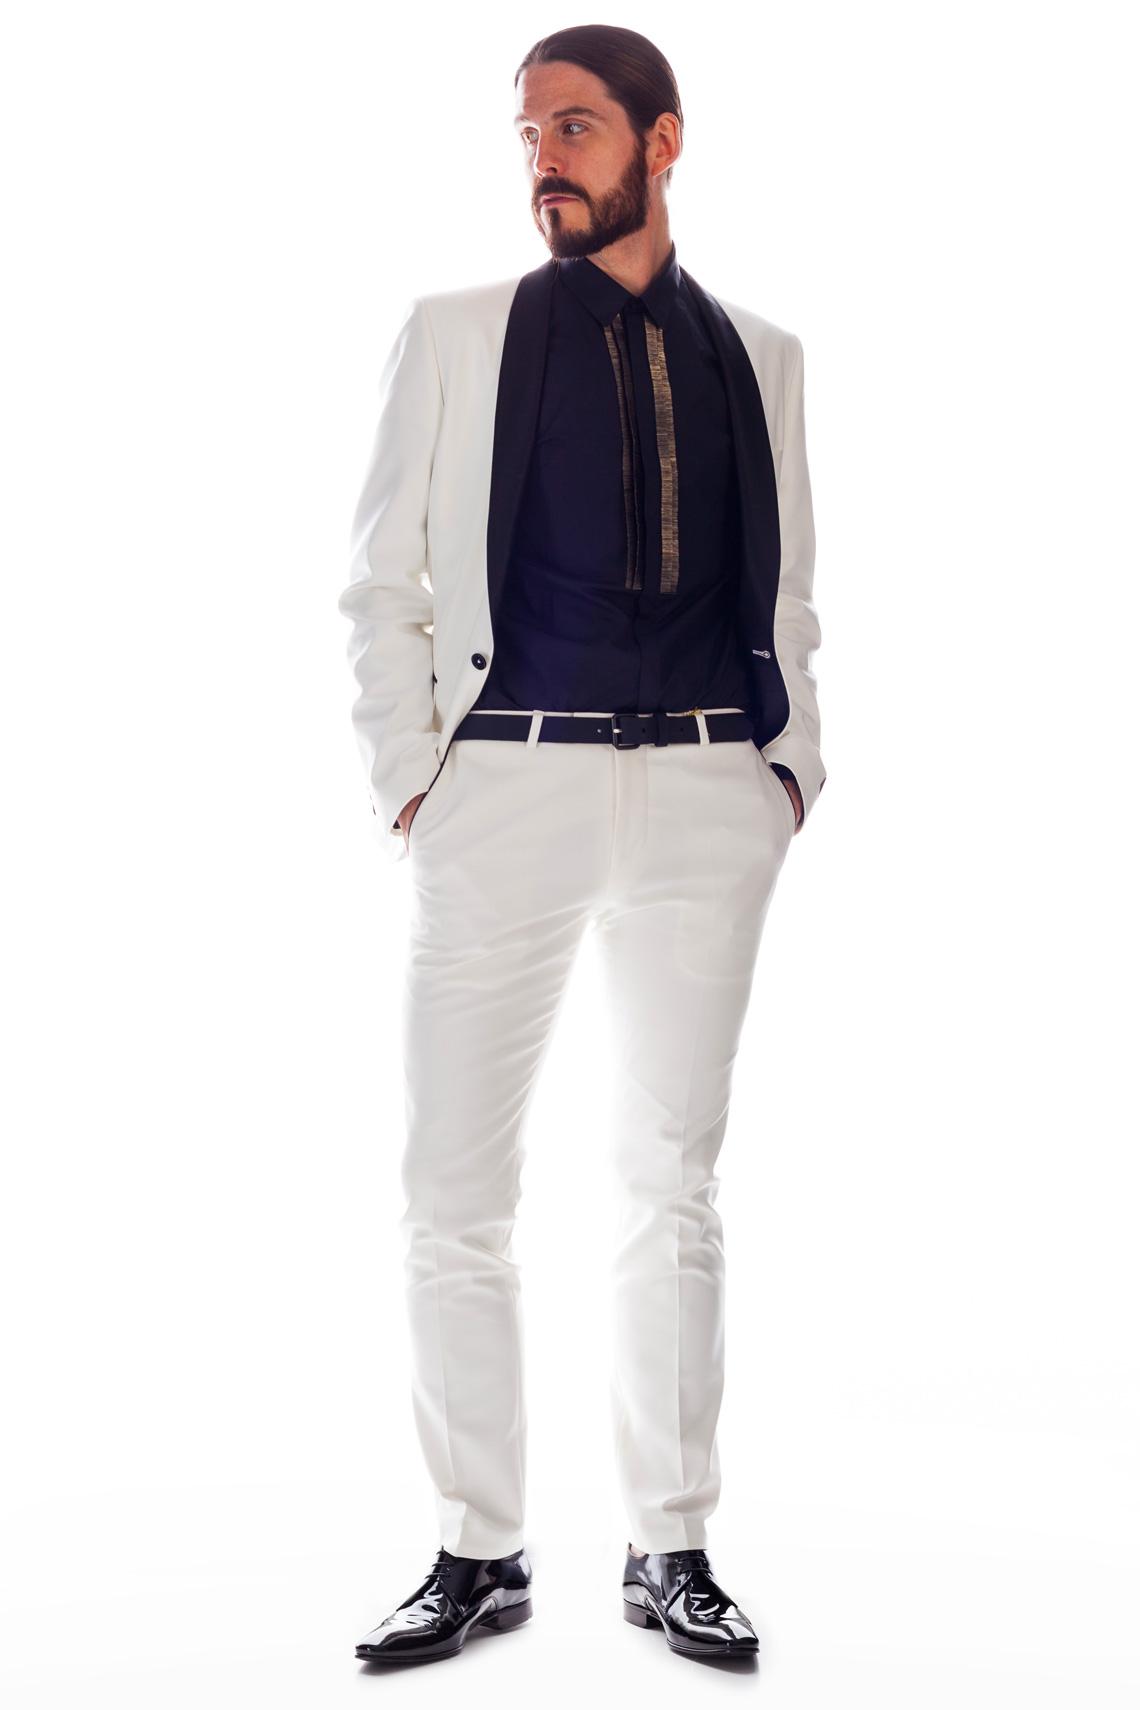 Kaisers-neue-Kleider_Fashionblog-Outfit_Weisser-Anzug_James_Bond_Hemd_The-Kooples02